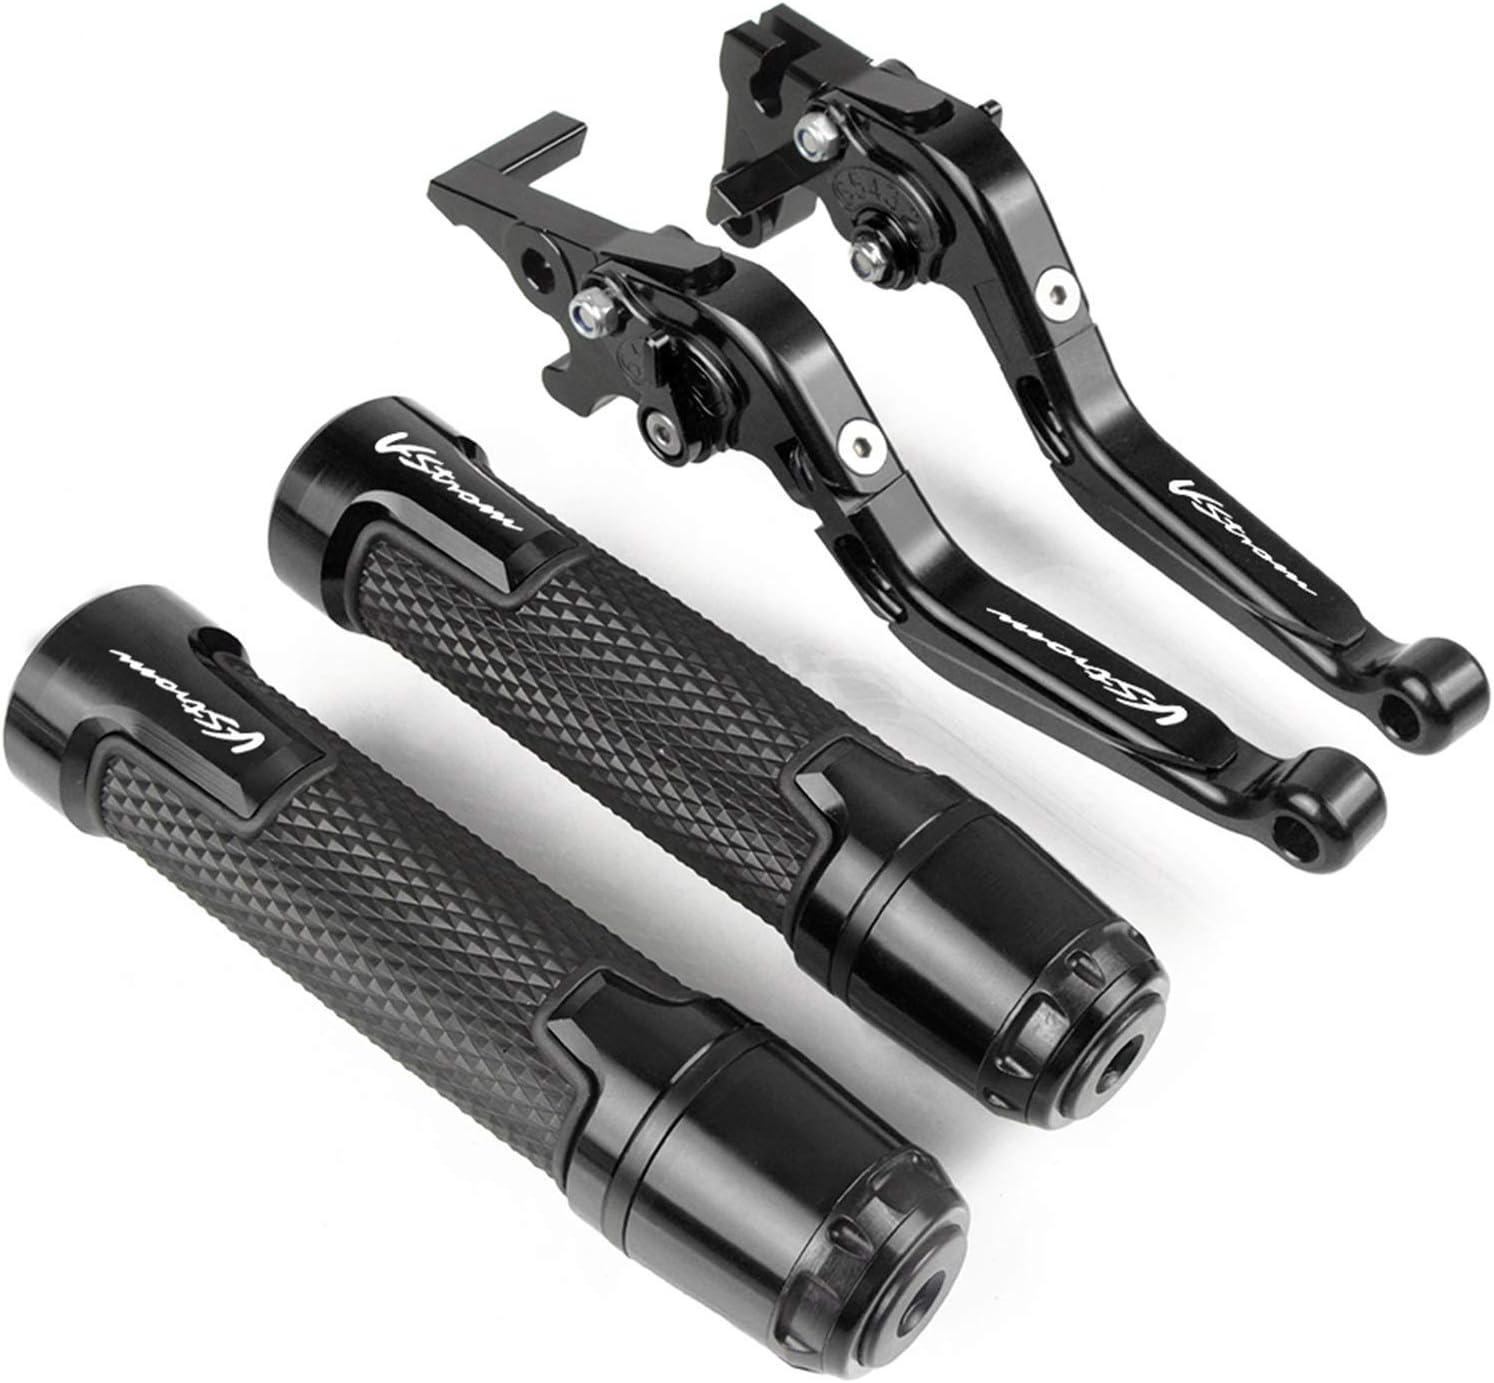 Motorcycle Clutch Grip Set For Suzuki V-str DL250 V-strom High quality new 250 Award DL